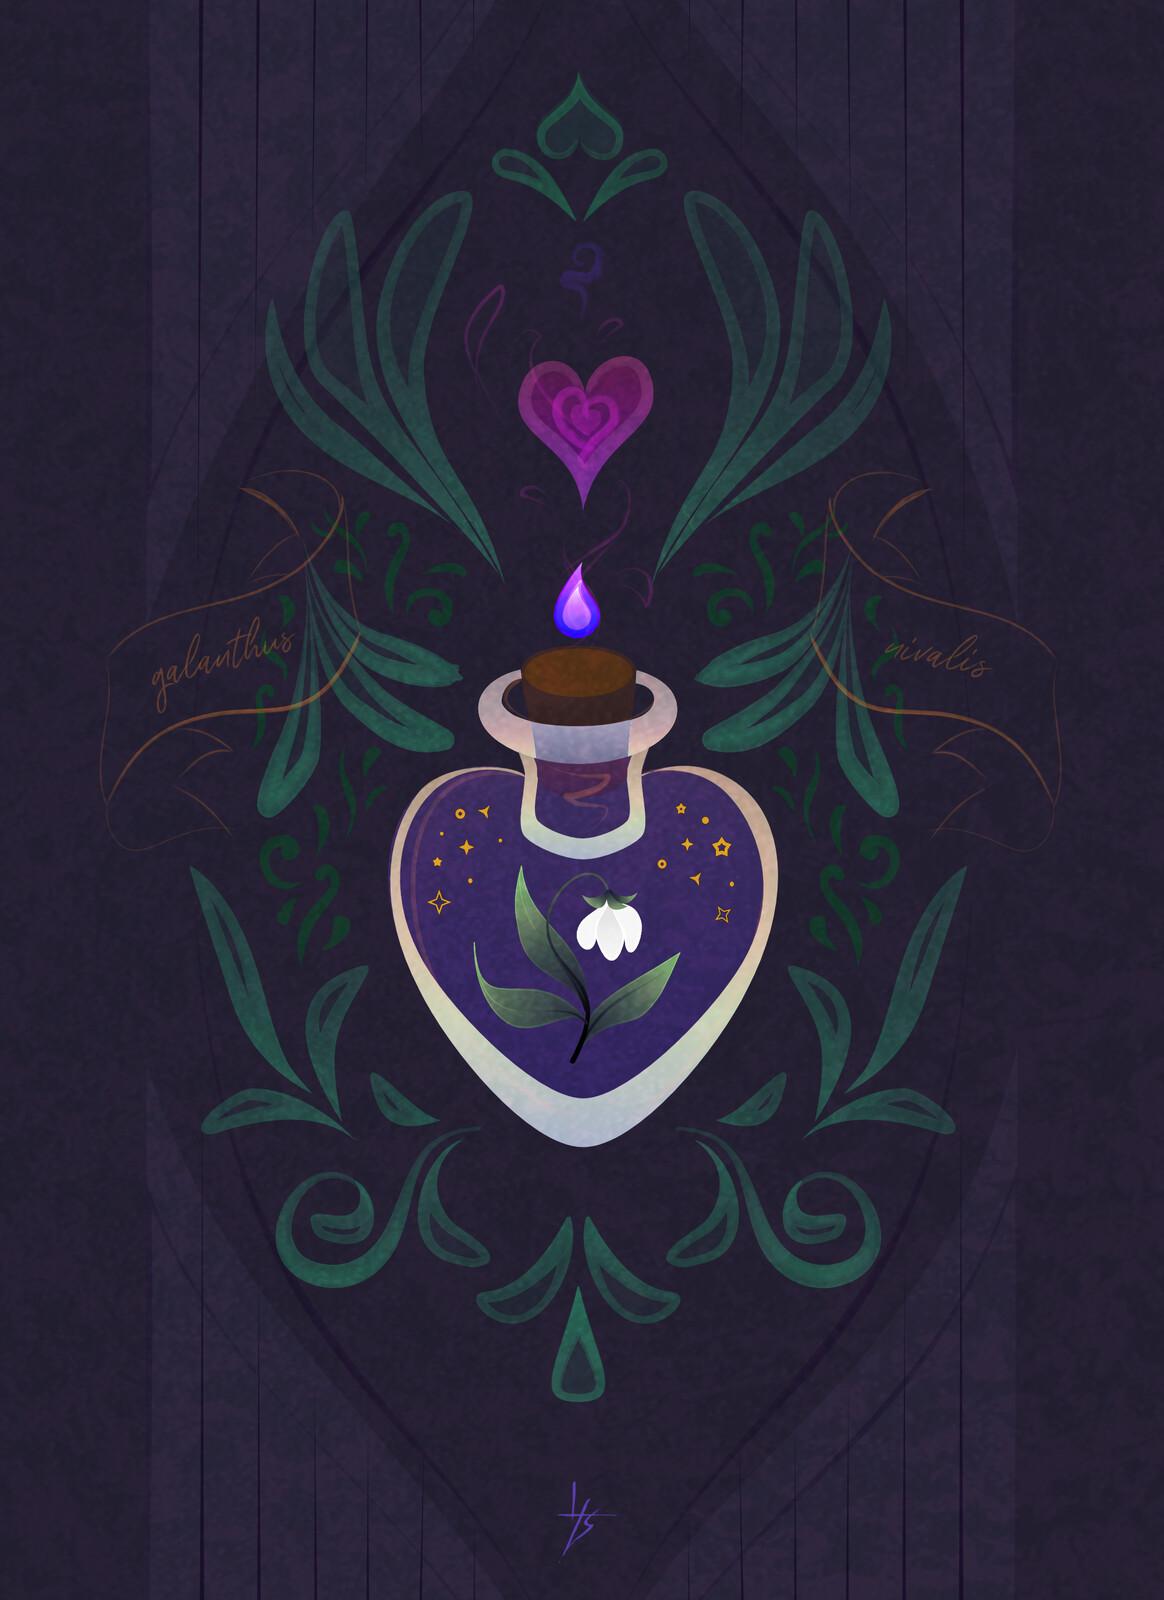 Galanthus Heart